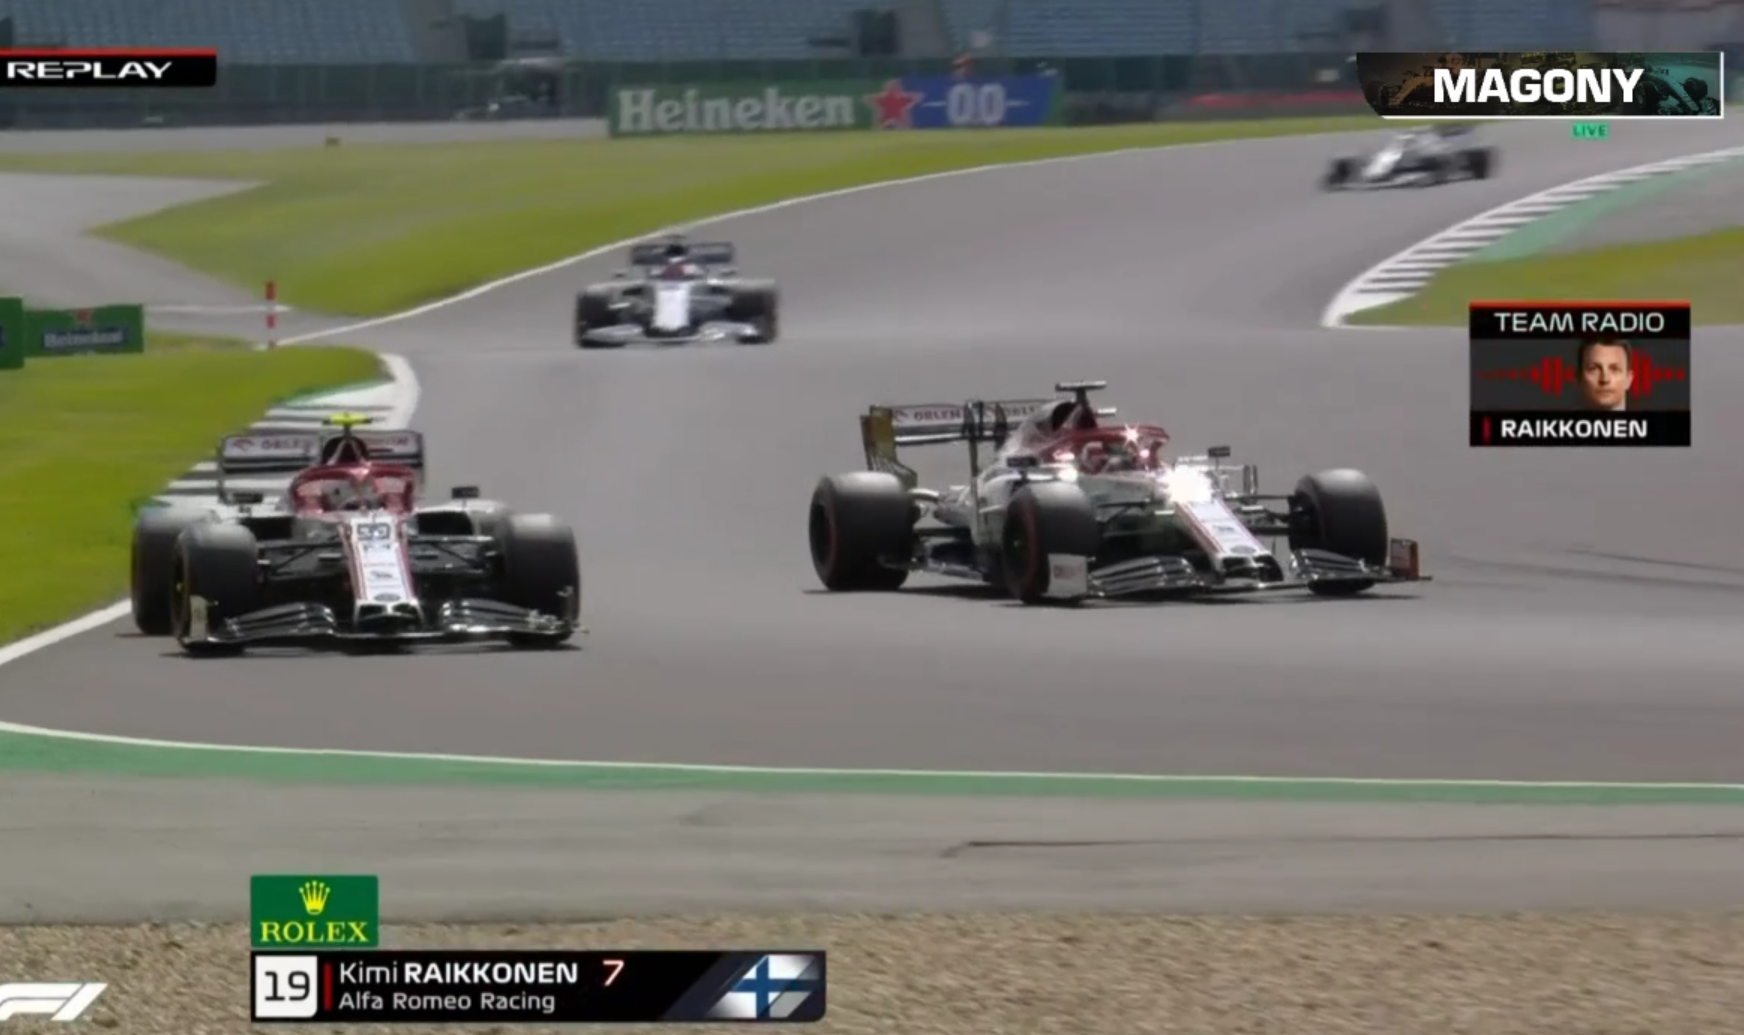 Kimi Räikkönen Furious Team Radio On His Teammate During FP3